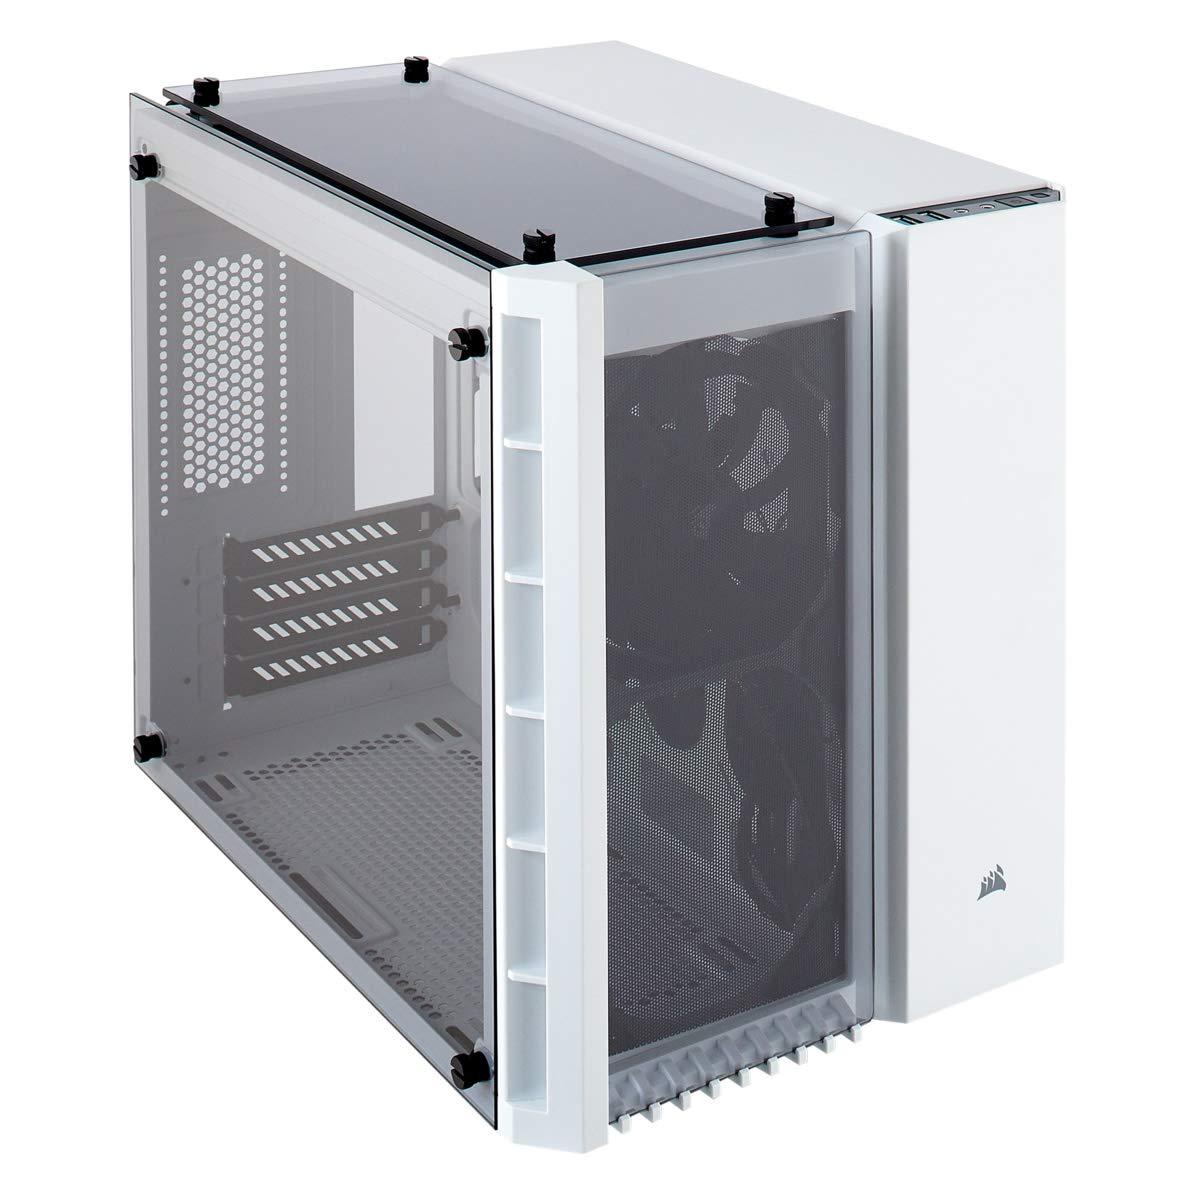 Corsair Crystal Series 280X - Caja de PC, ATX, tres paneles de cristal templado sin iluminación Nessun LED, Blanco: Amazon.es: Informática